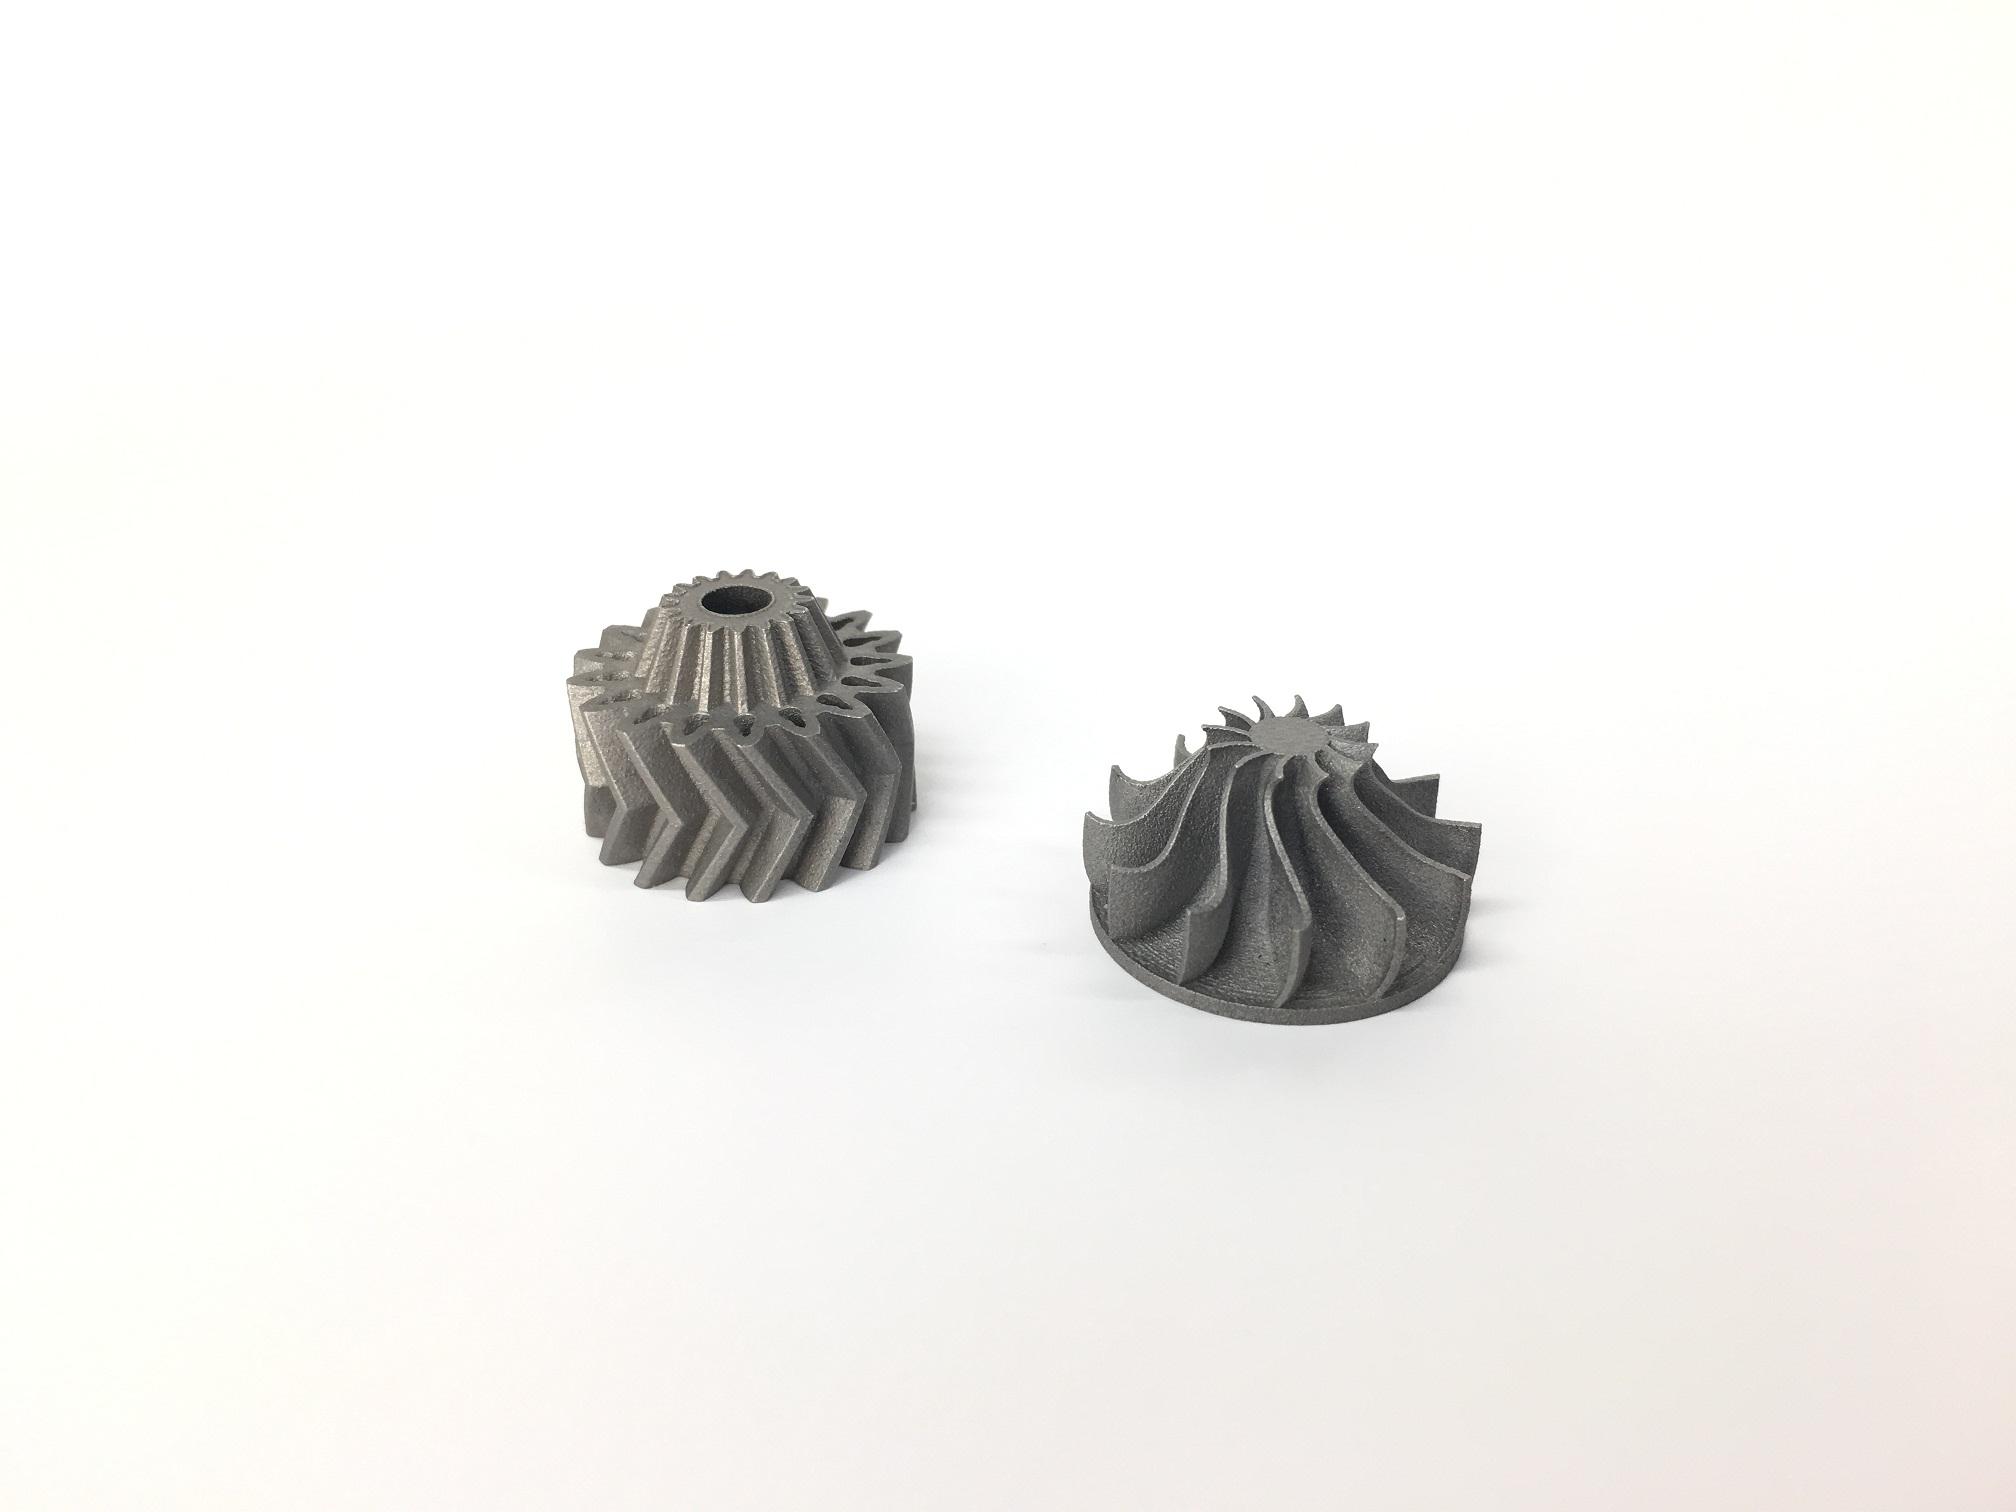 3d metal printing turbo parts